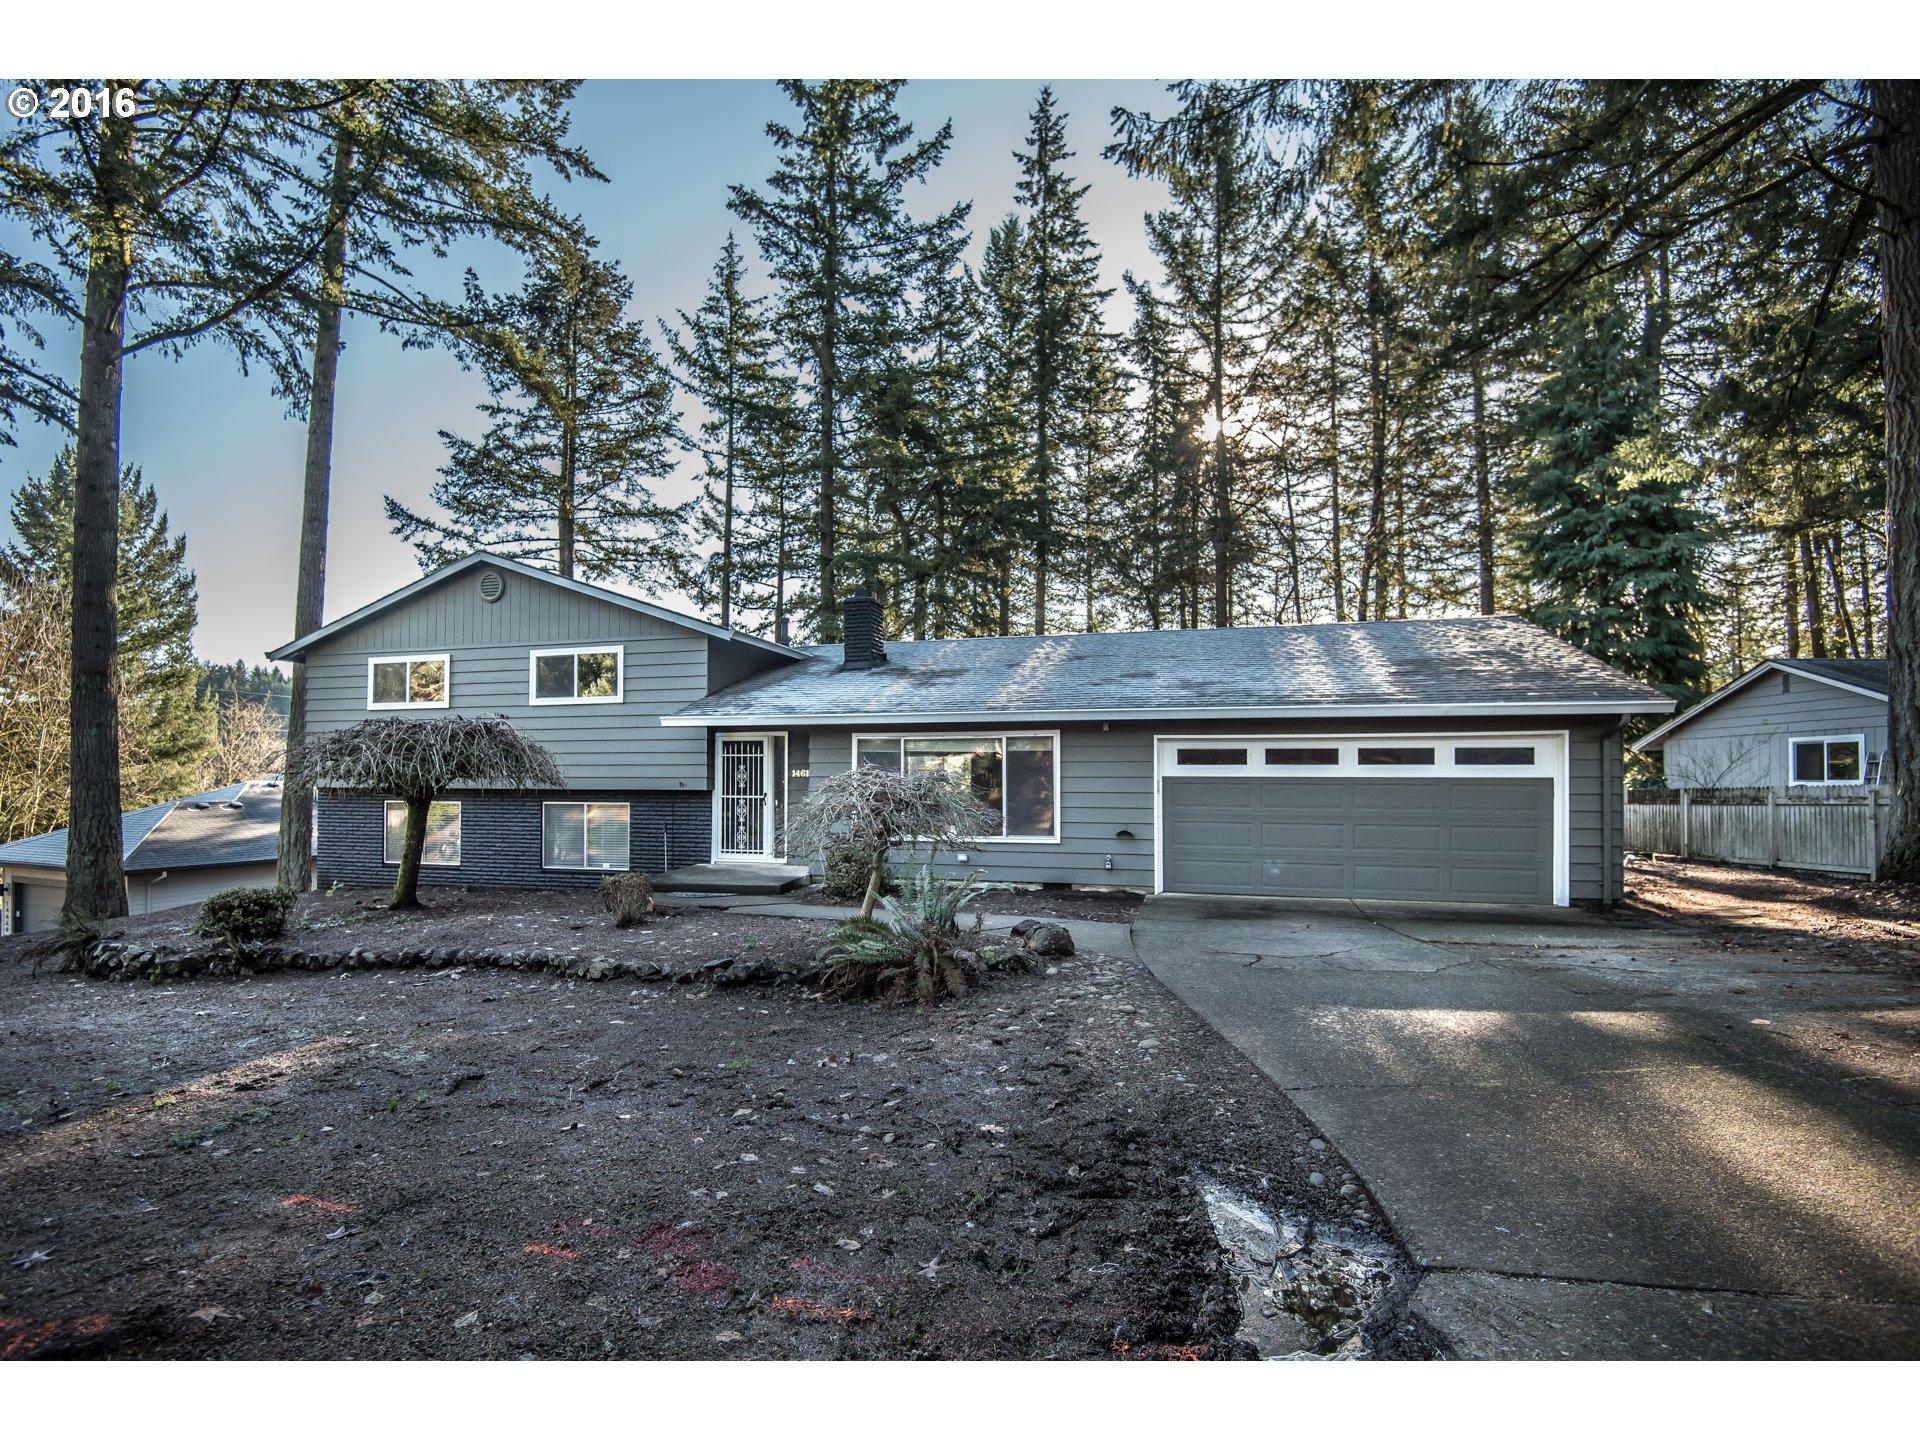 14612 KELMSLEY DR, Oregon City, OR 97045